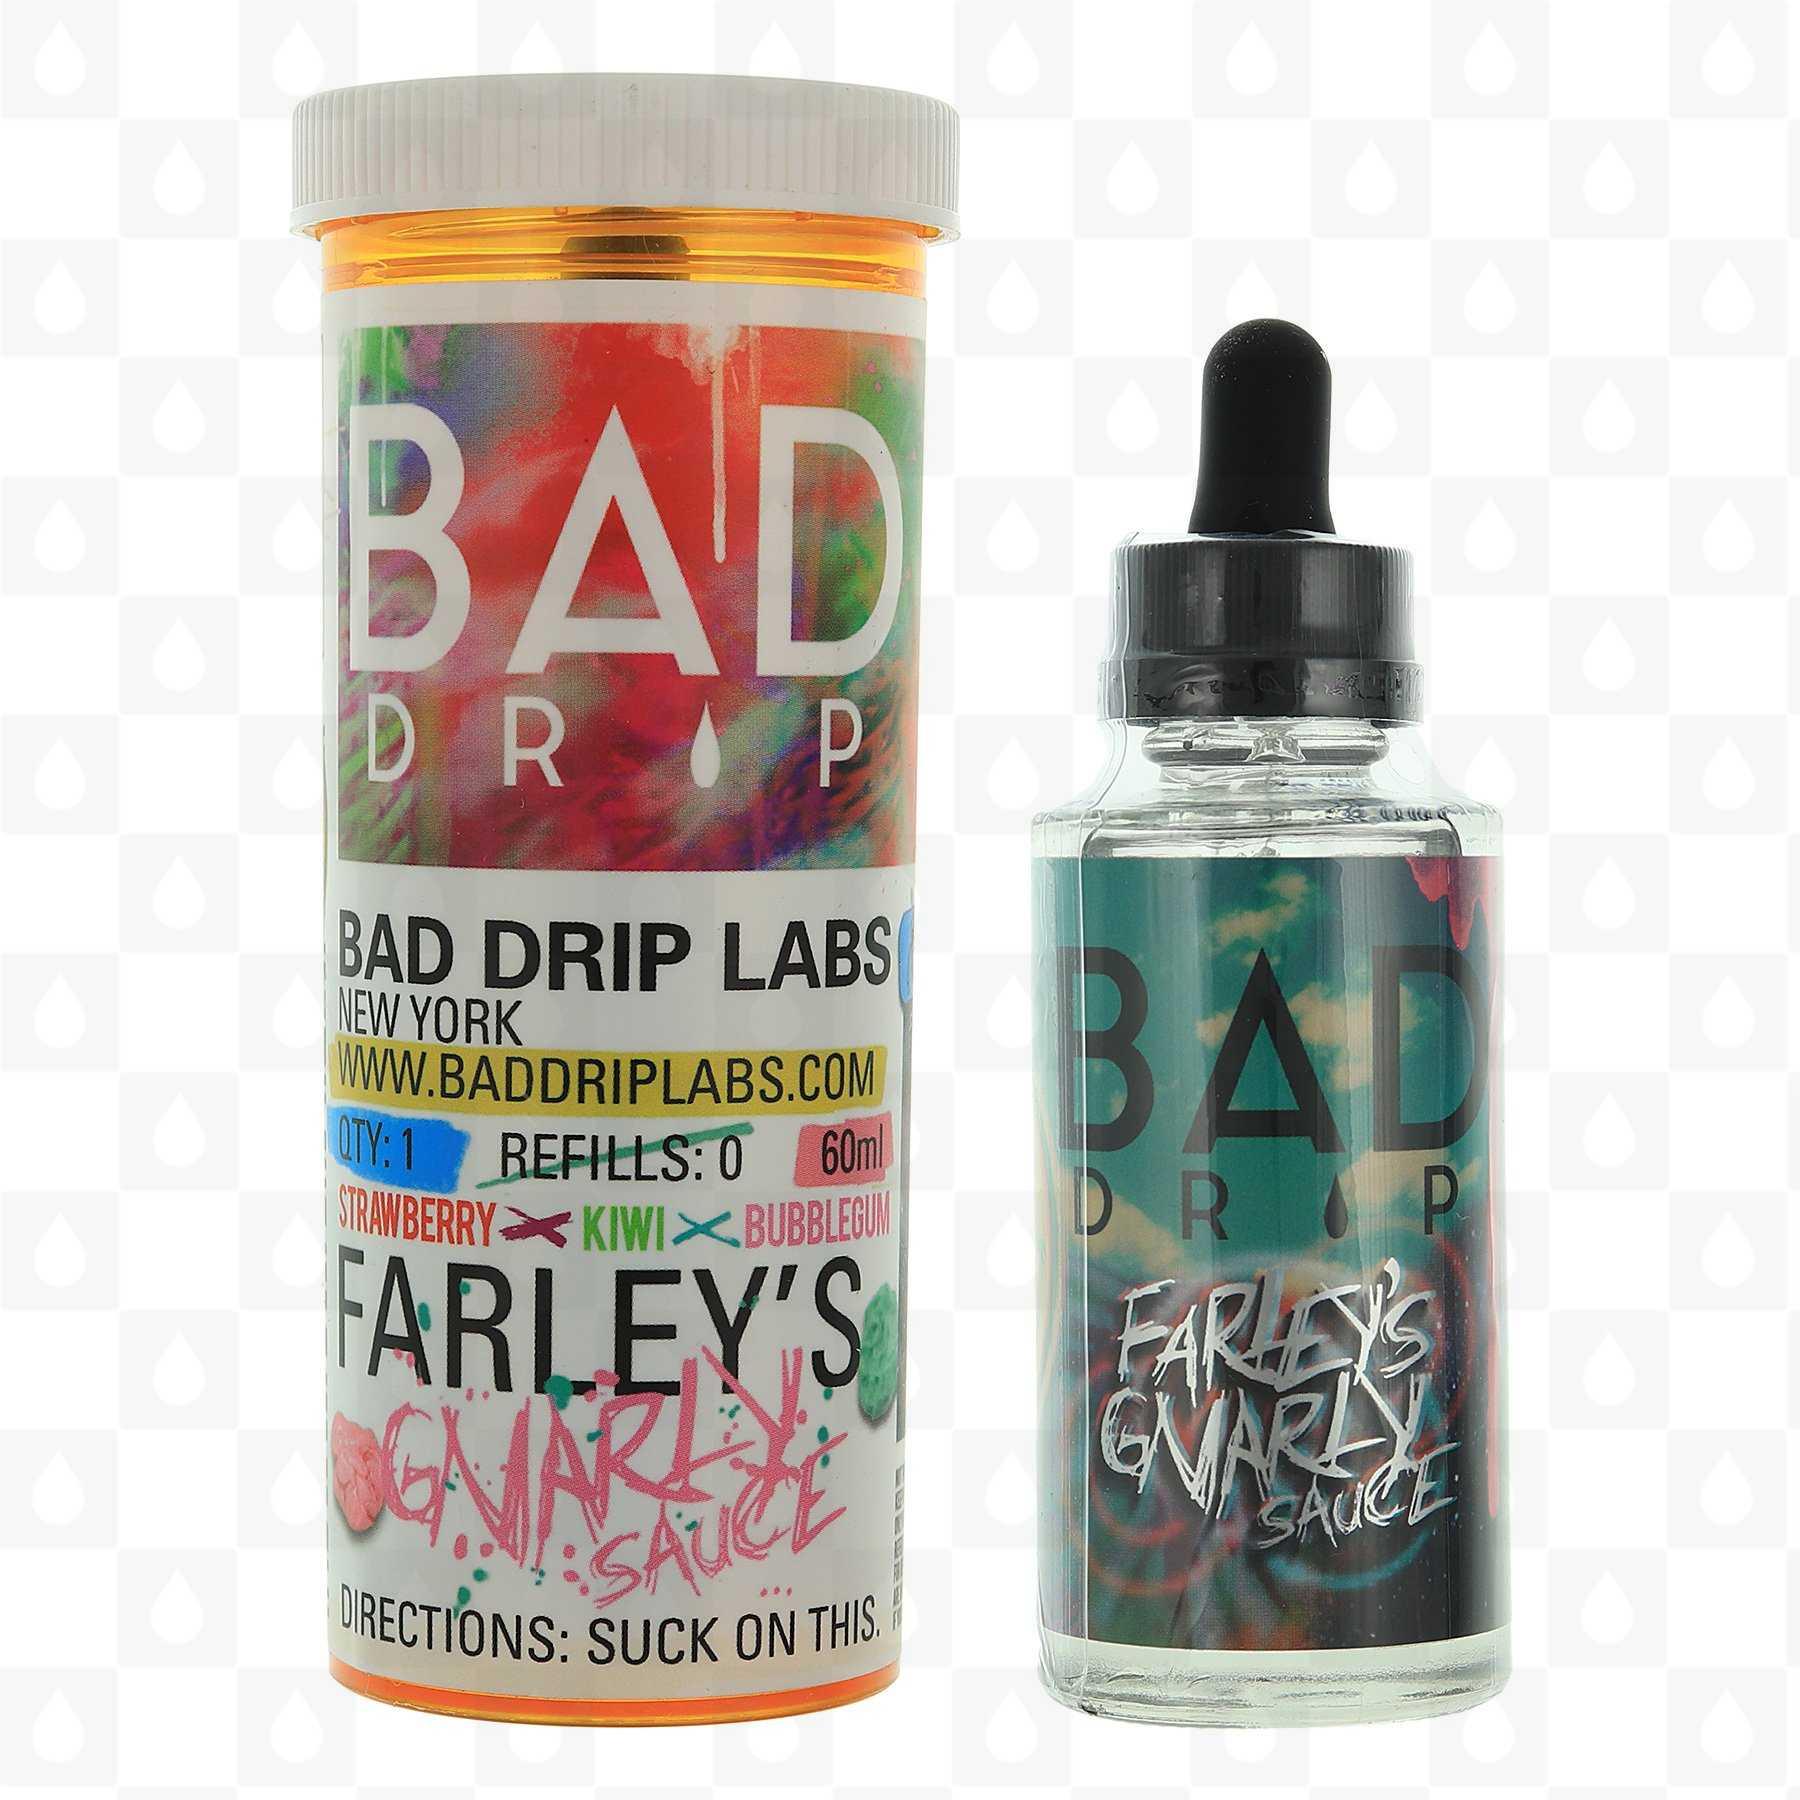 Farley's Gnarly Sauce by Bad Drip E Liquid | 50ml Short Fill